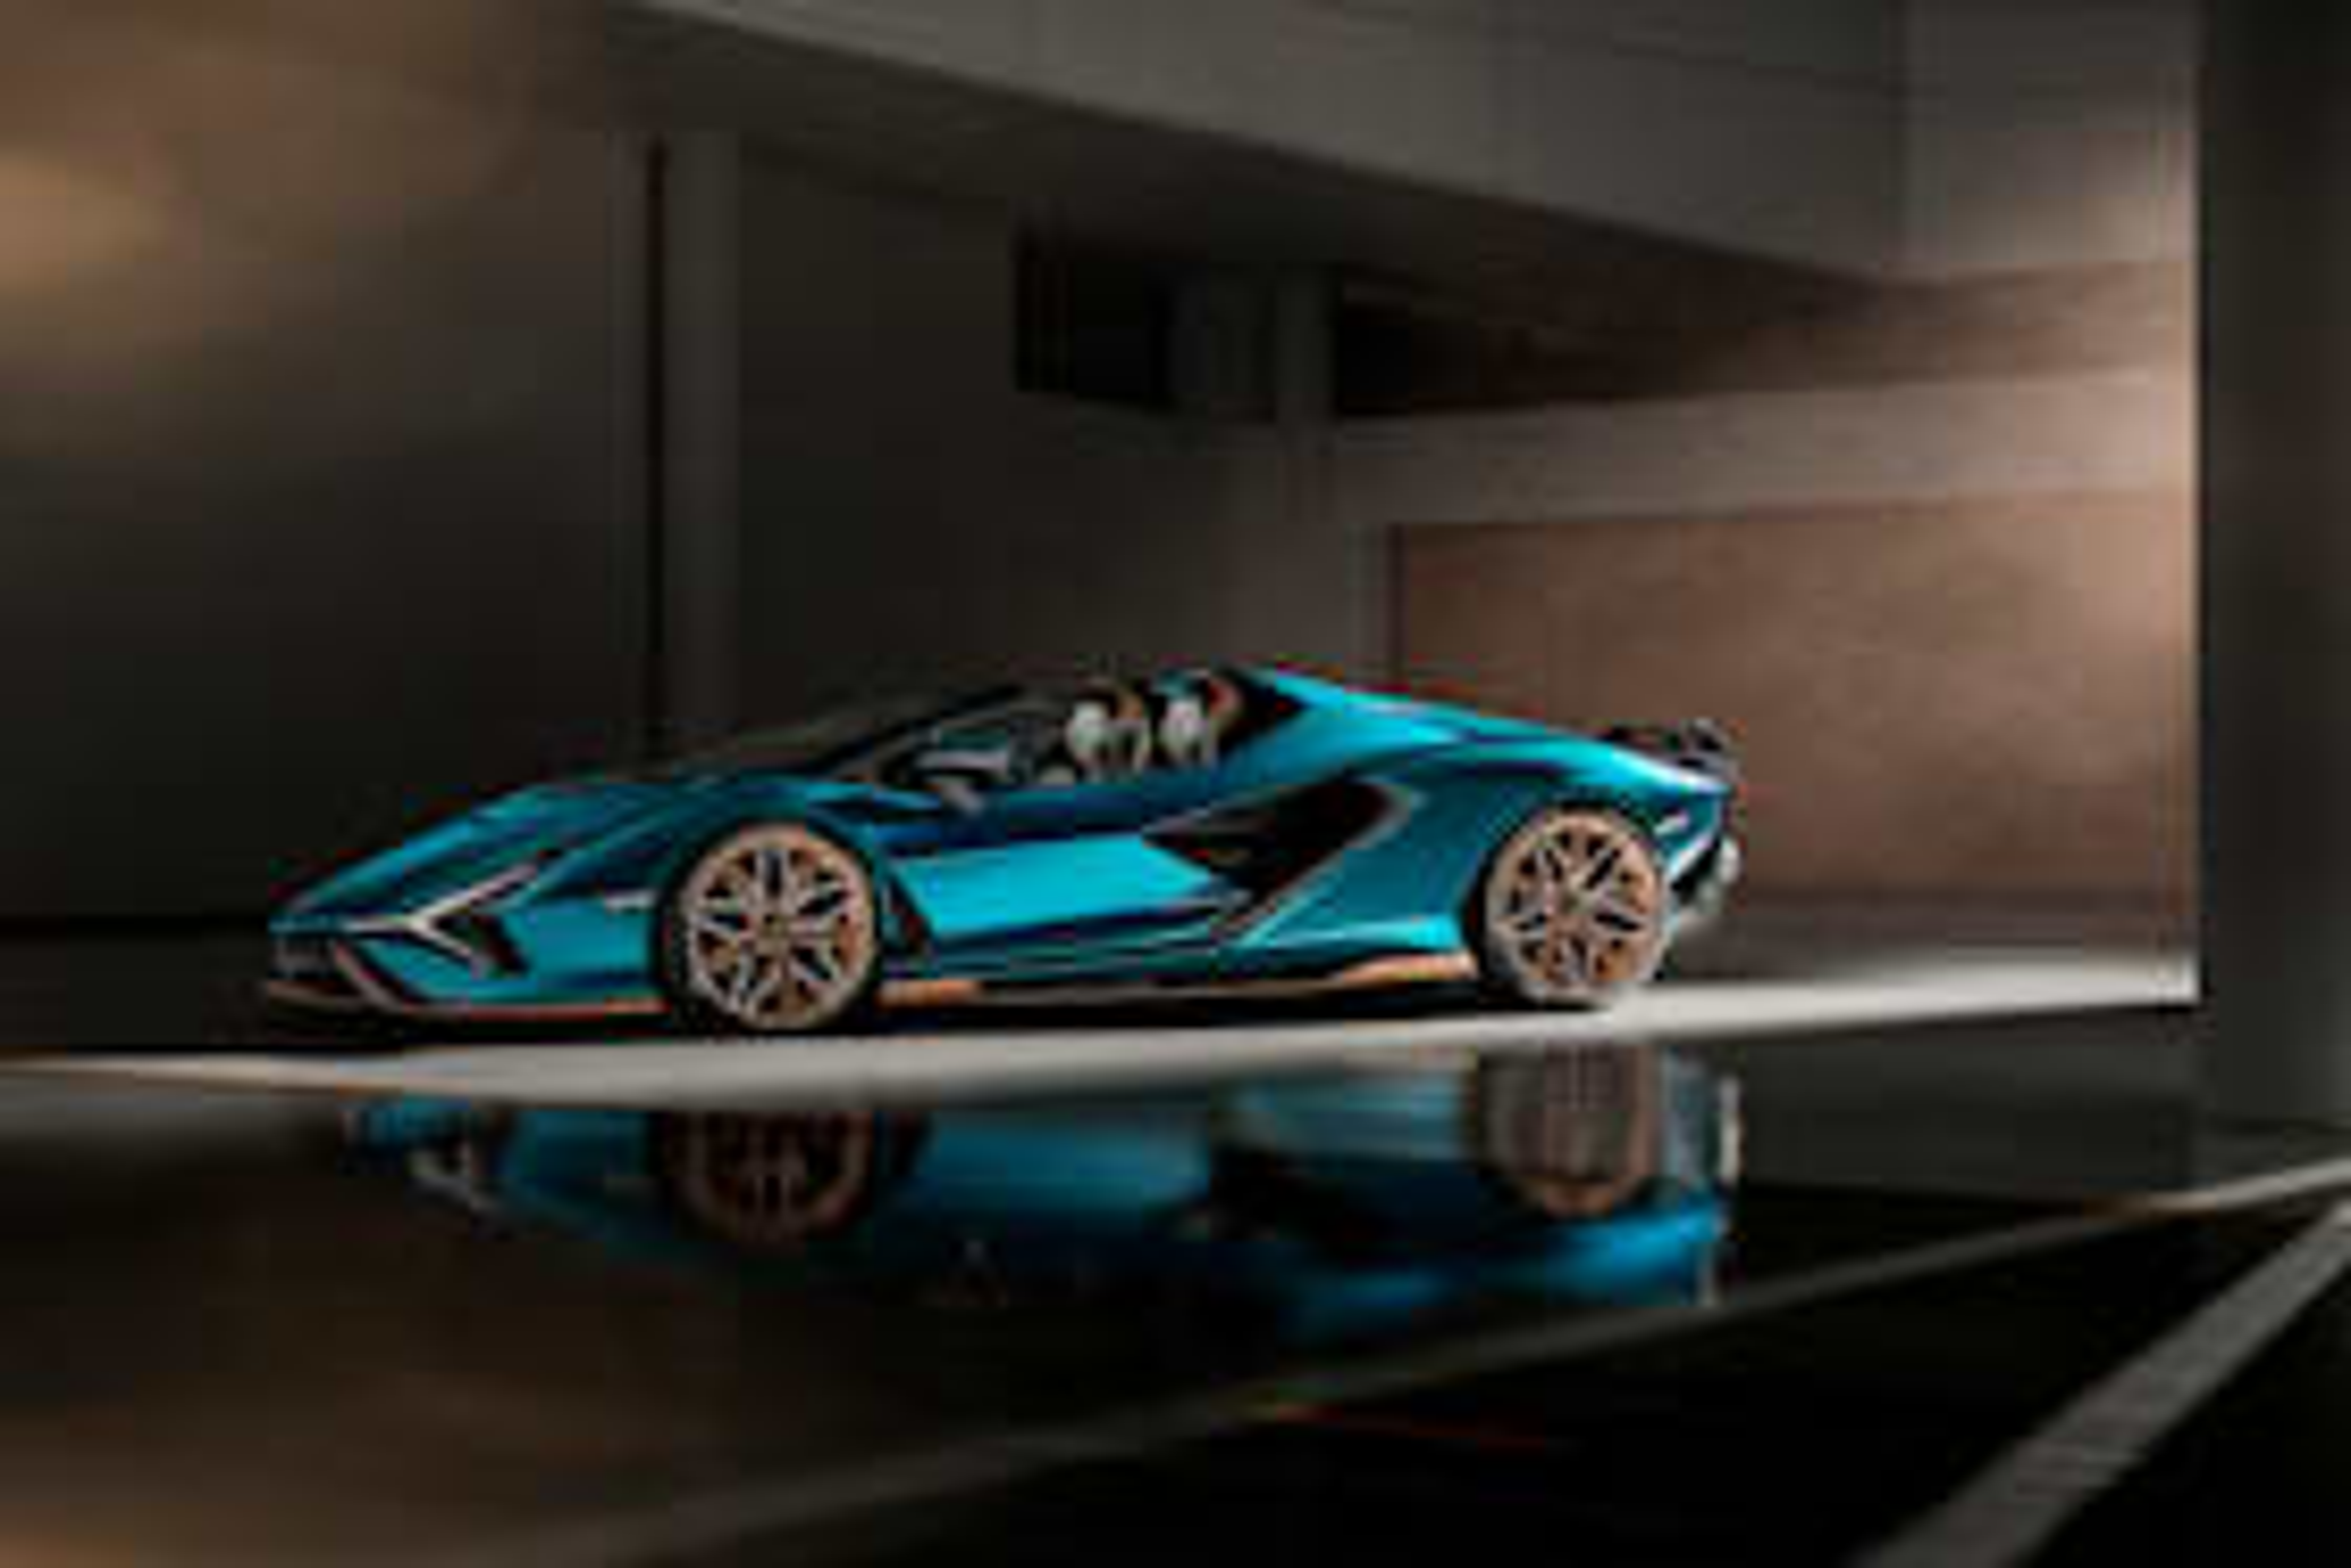 Lamborghini's hybrid future